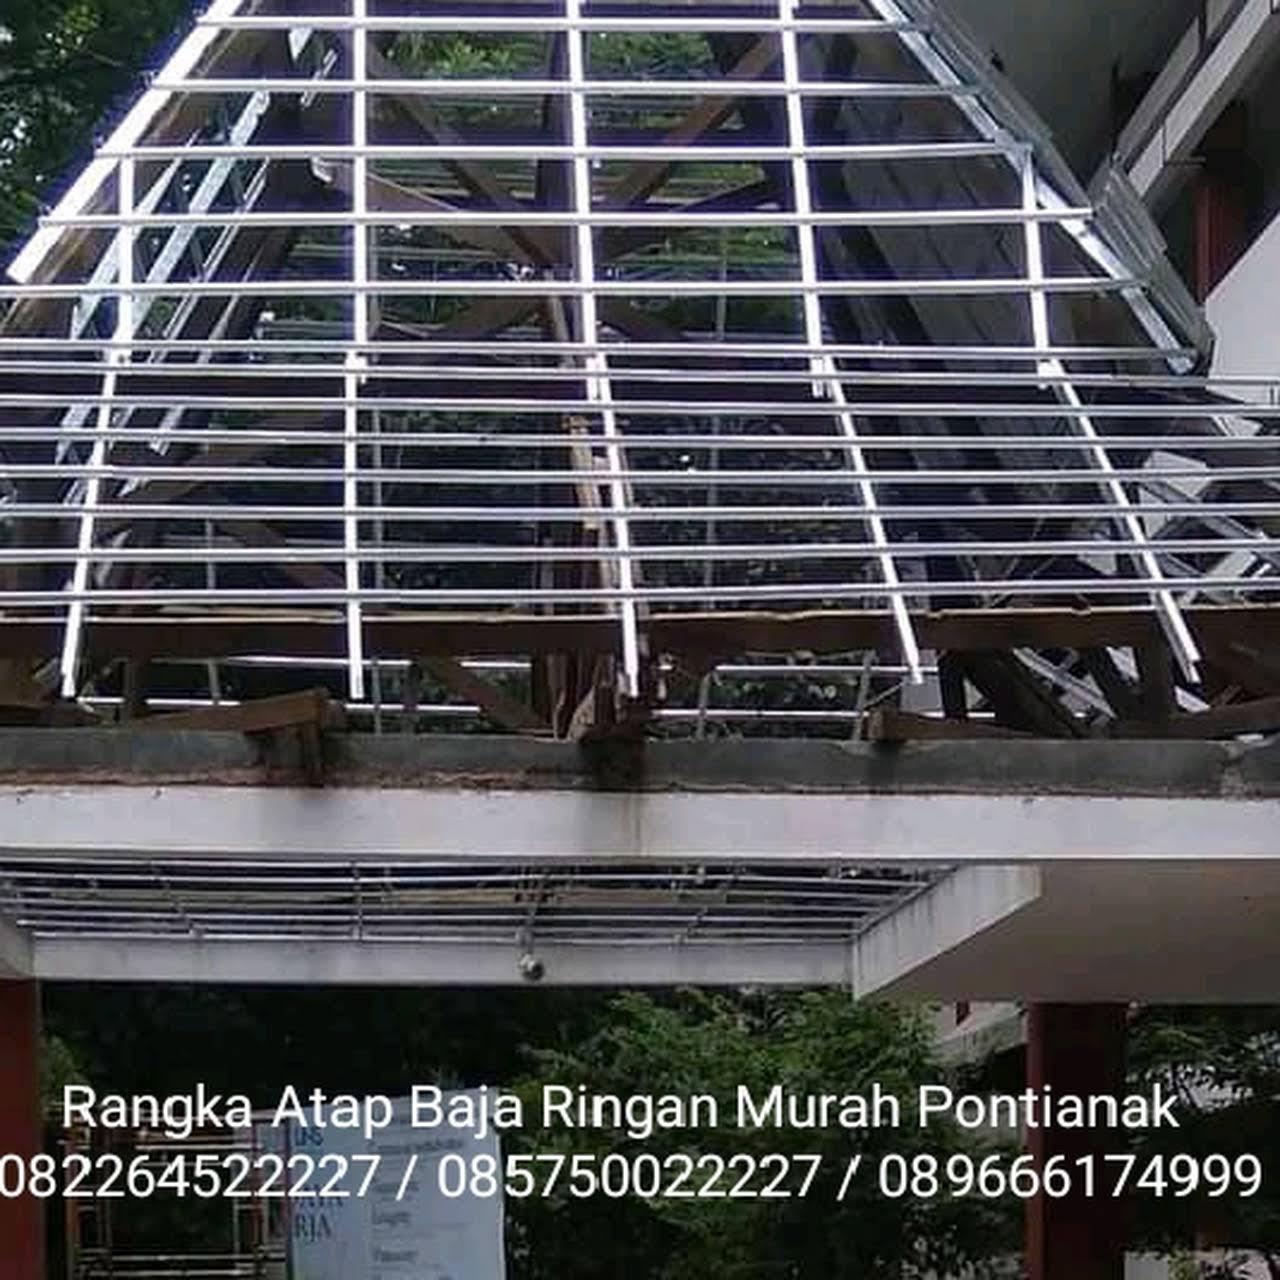 kanopi baja ringan pontianak rangka atap plapon murah jasa tukang